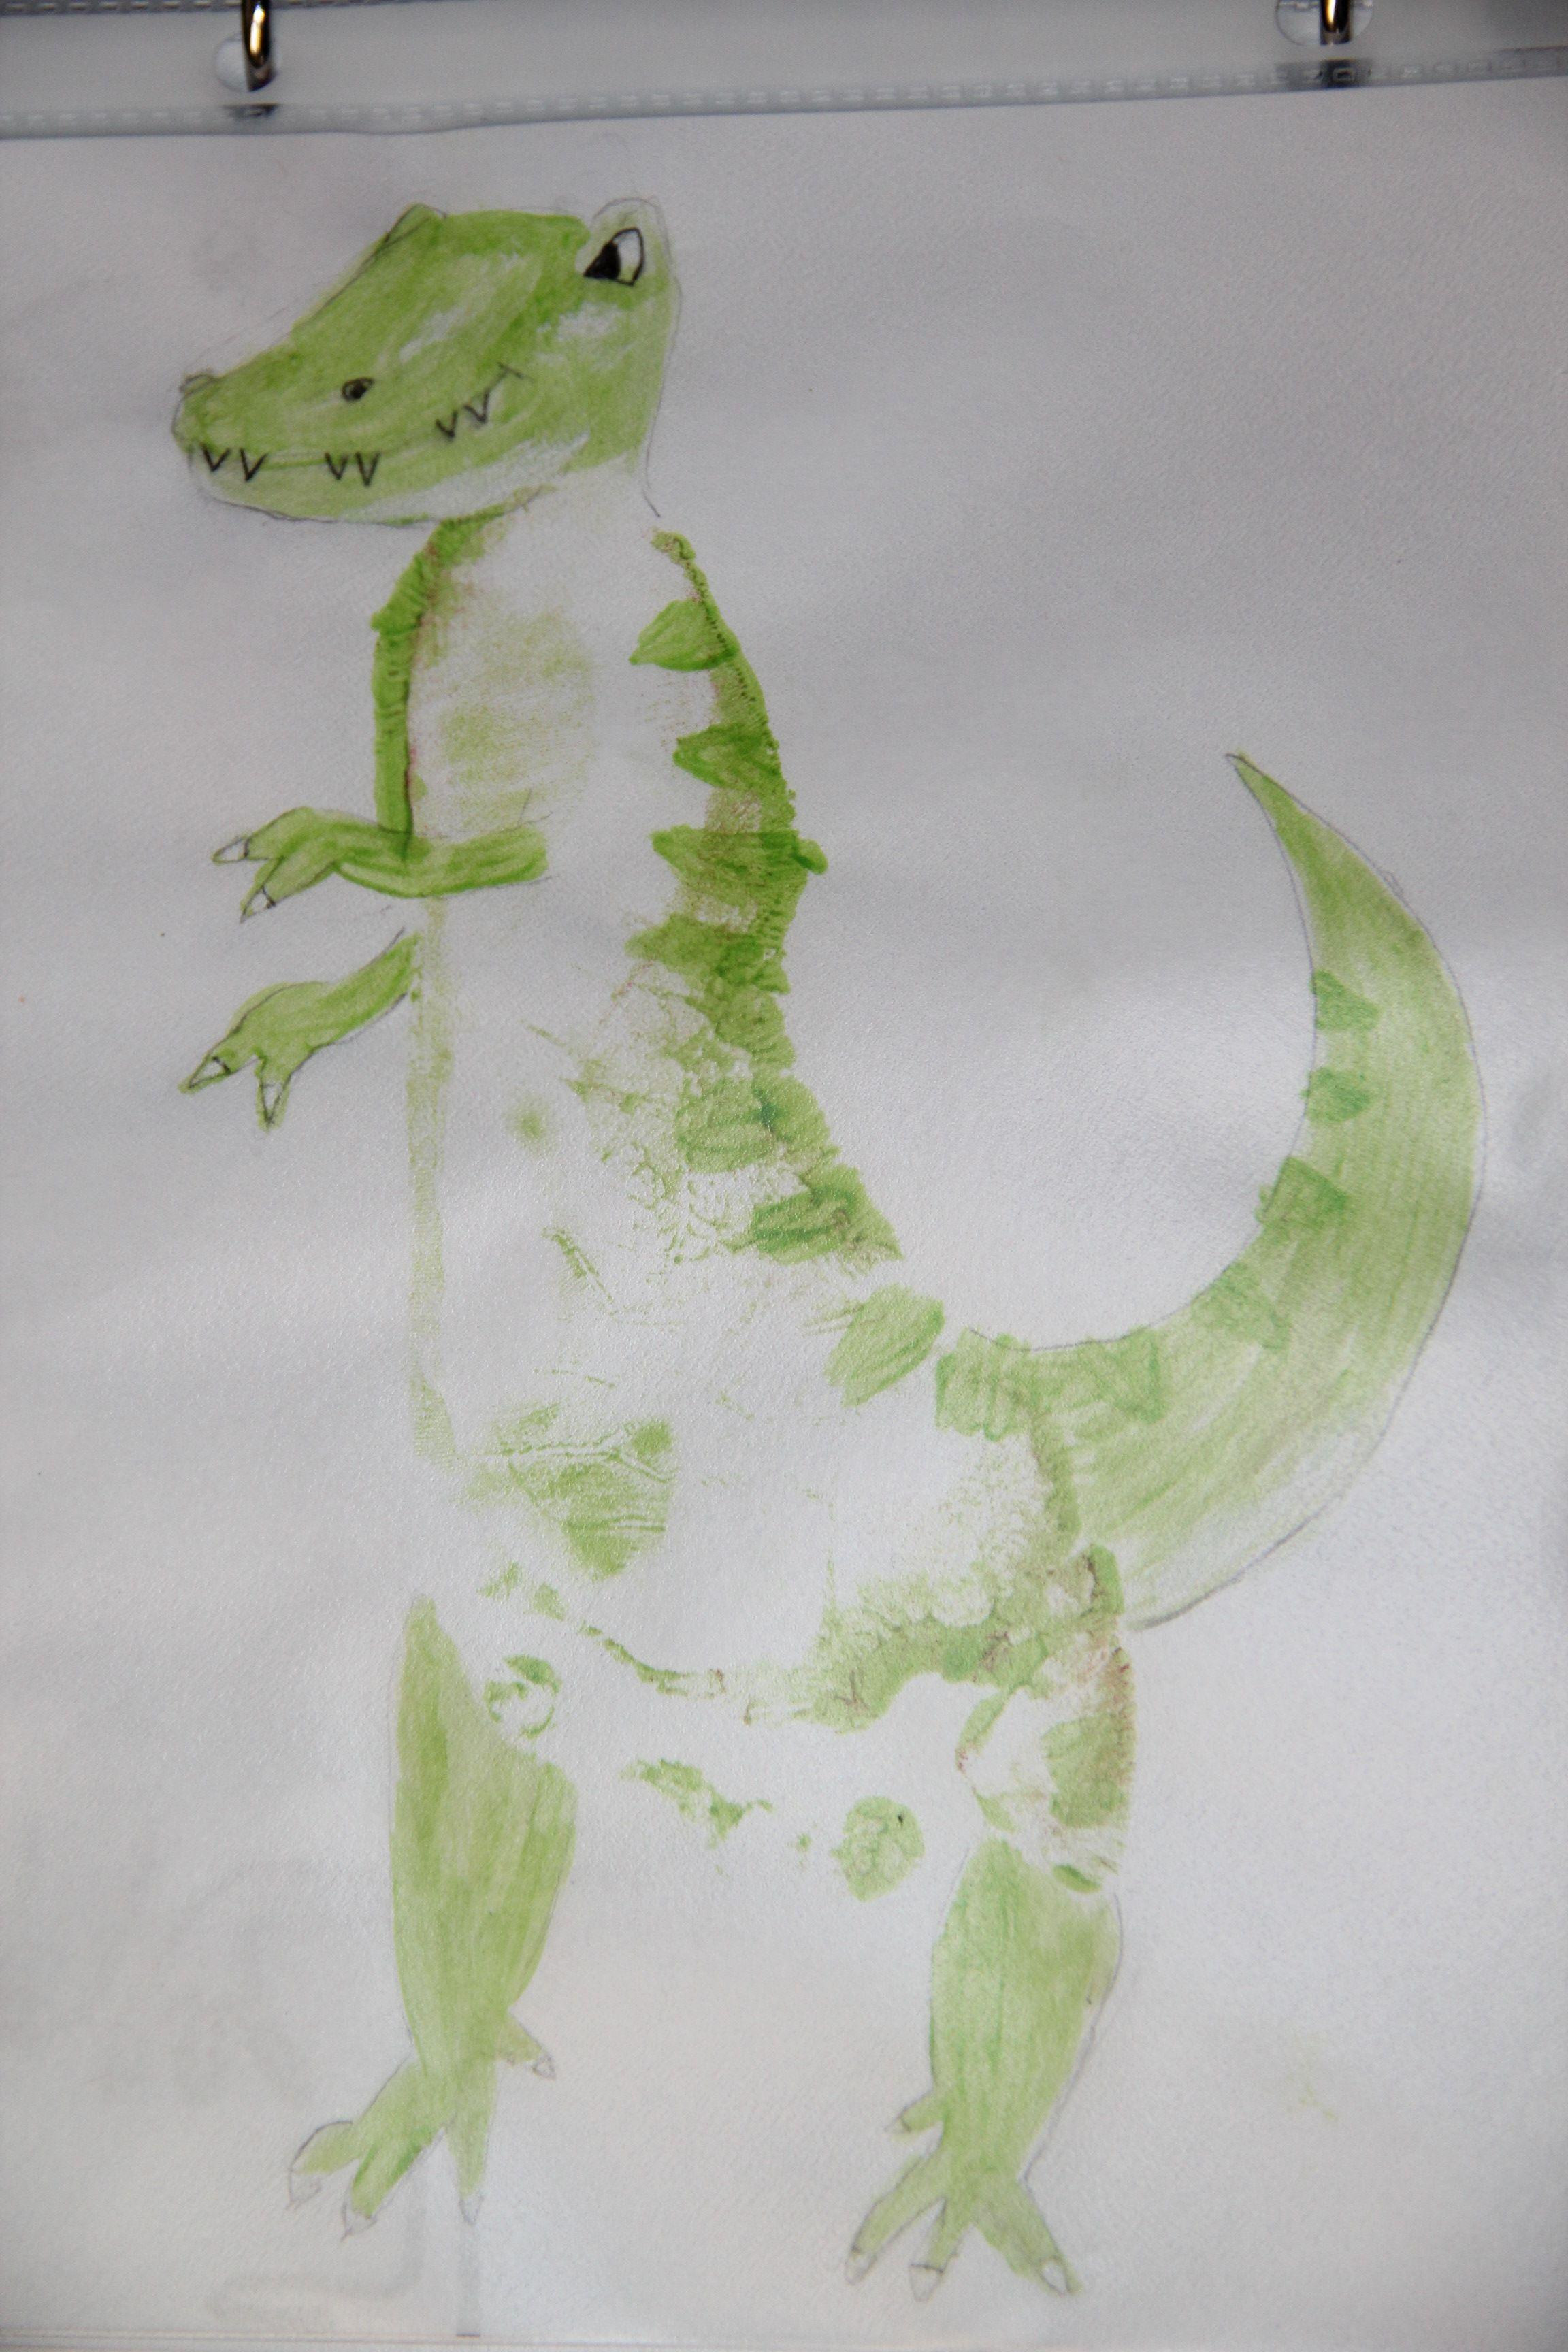 Diy Footprint Dinosaur Craft For Kids Or Is It An